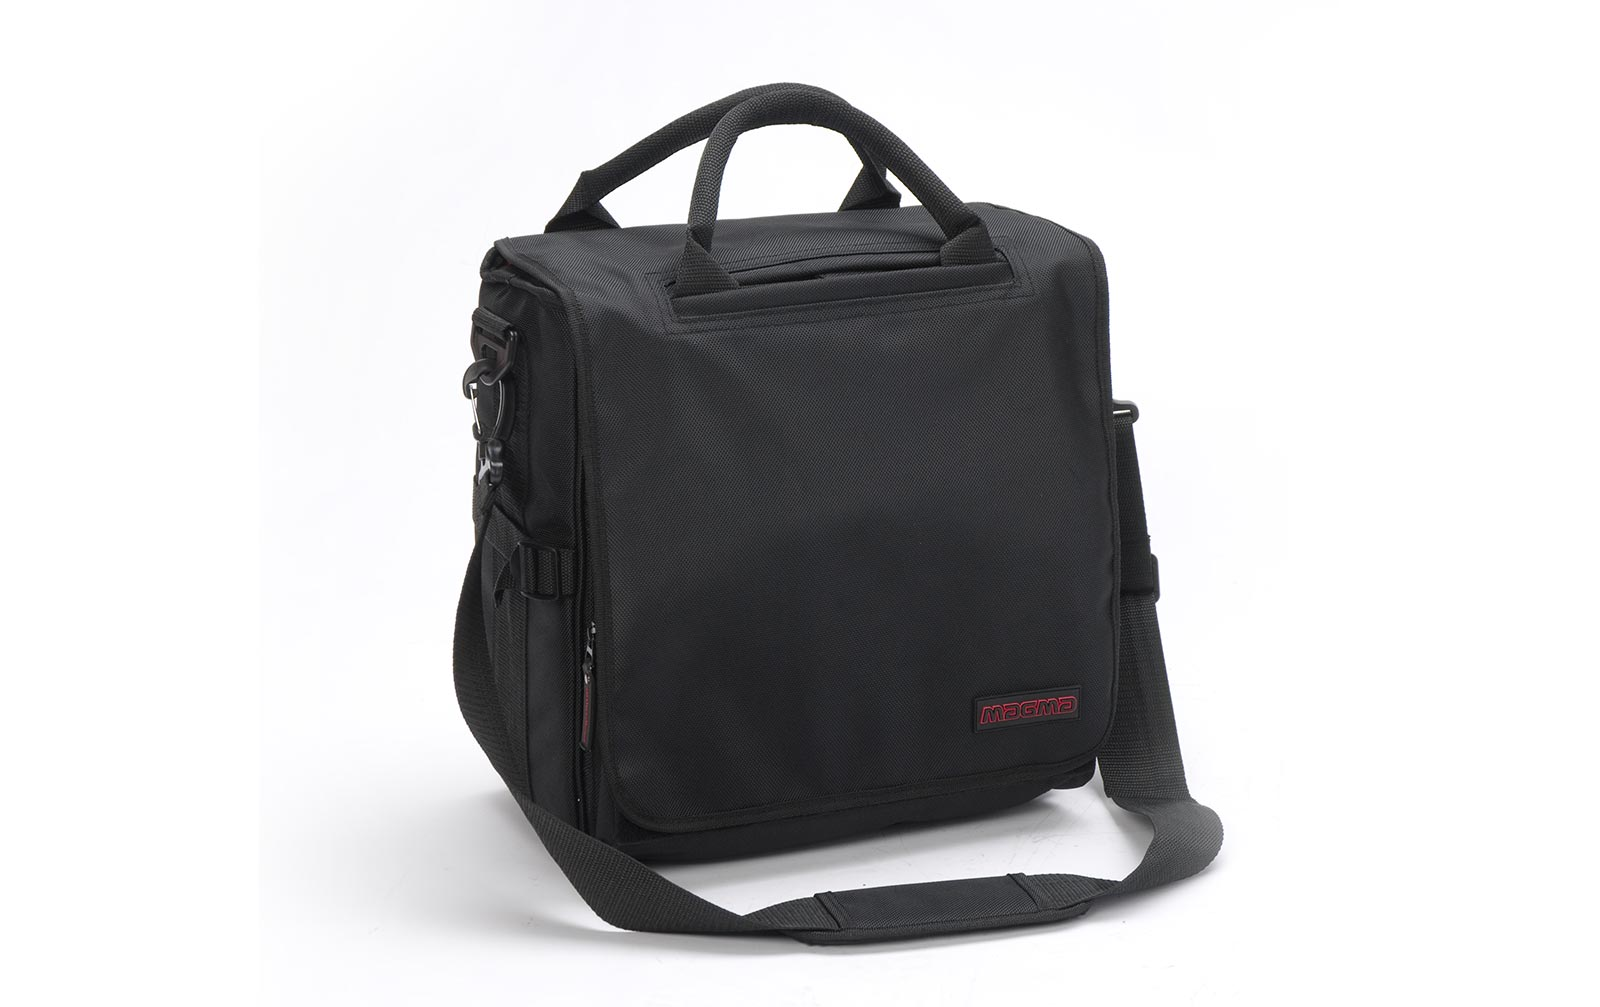 magma-lp-bag-40-ii-black-red-42640-